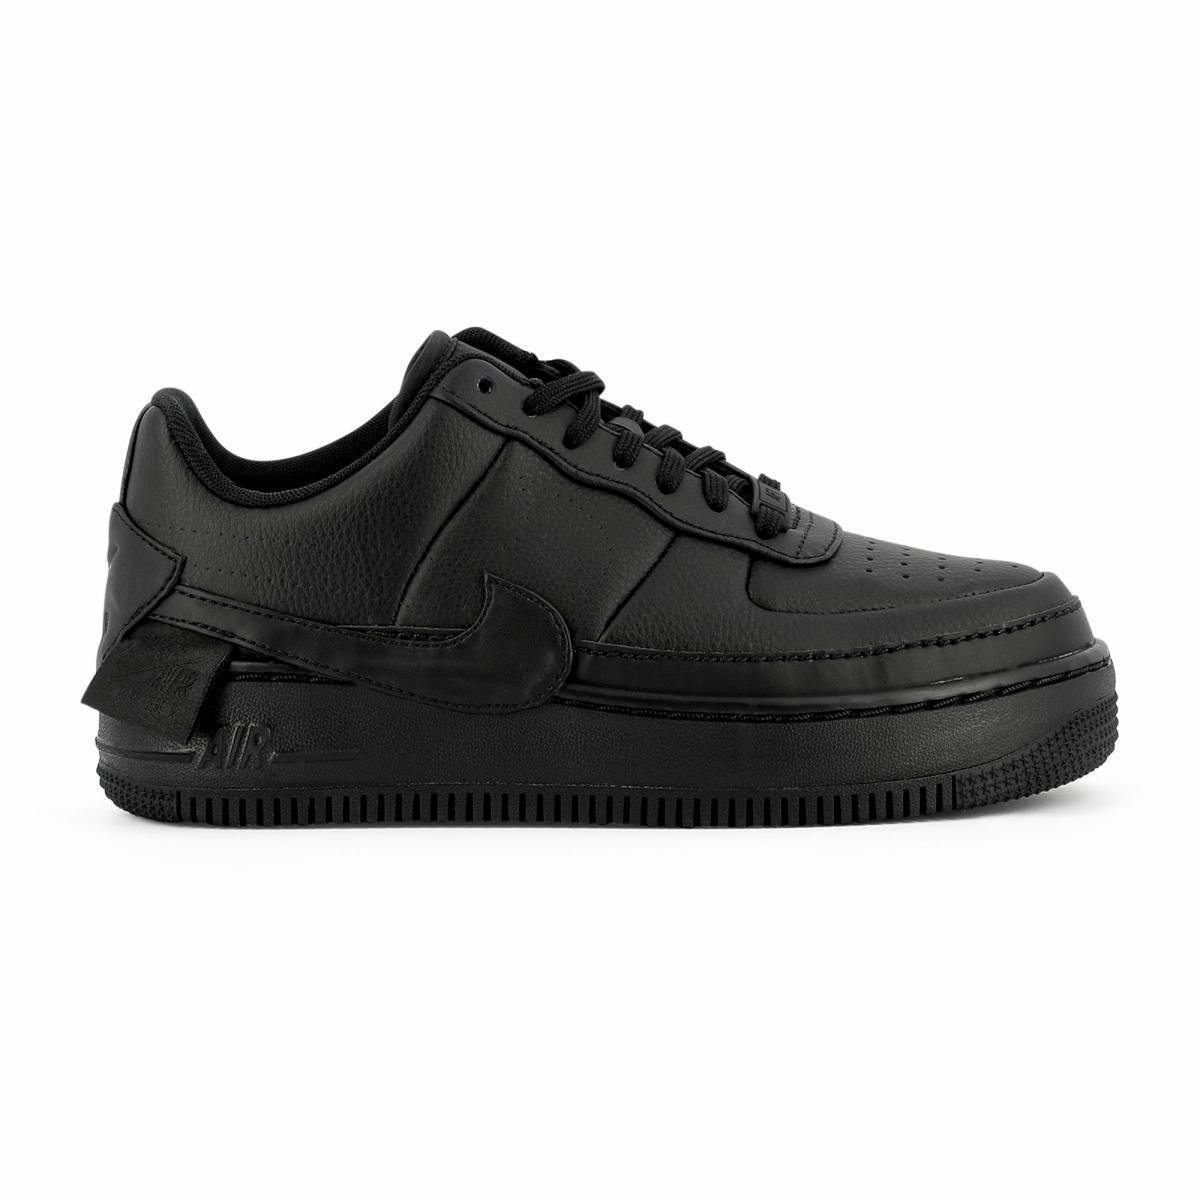 air force noir femme,Nike AIR FORCE 1 '07 W Noir - Chaussures Baskets  basses Femme 96